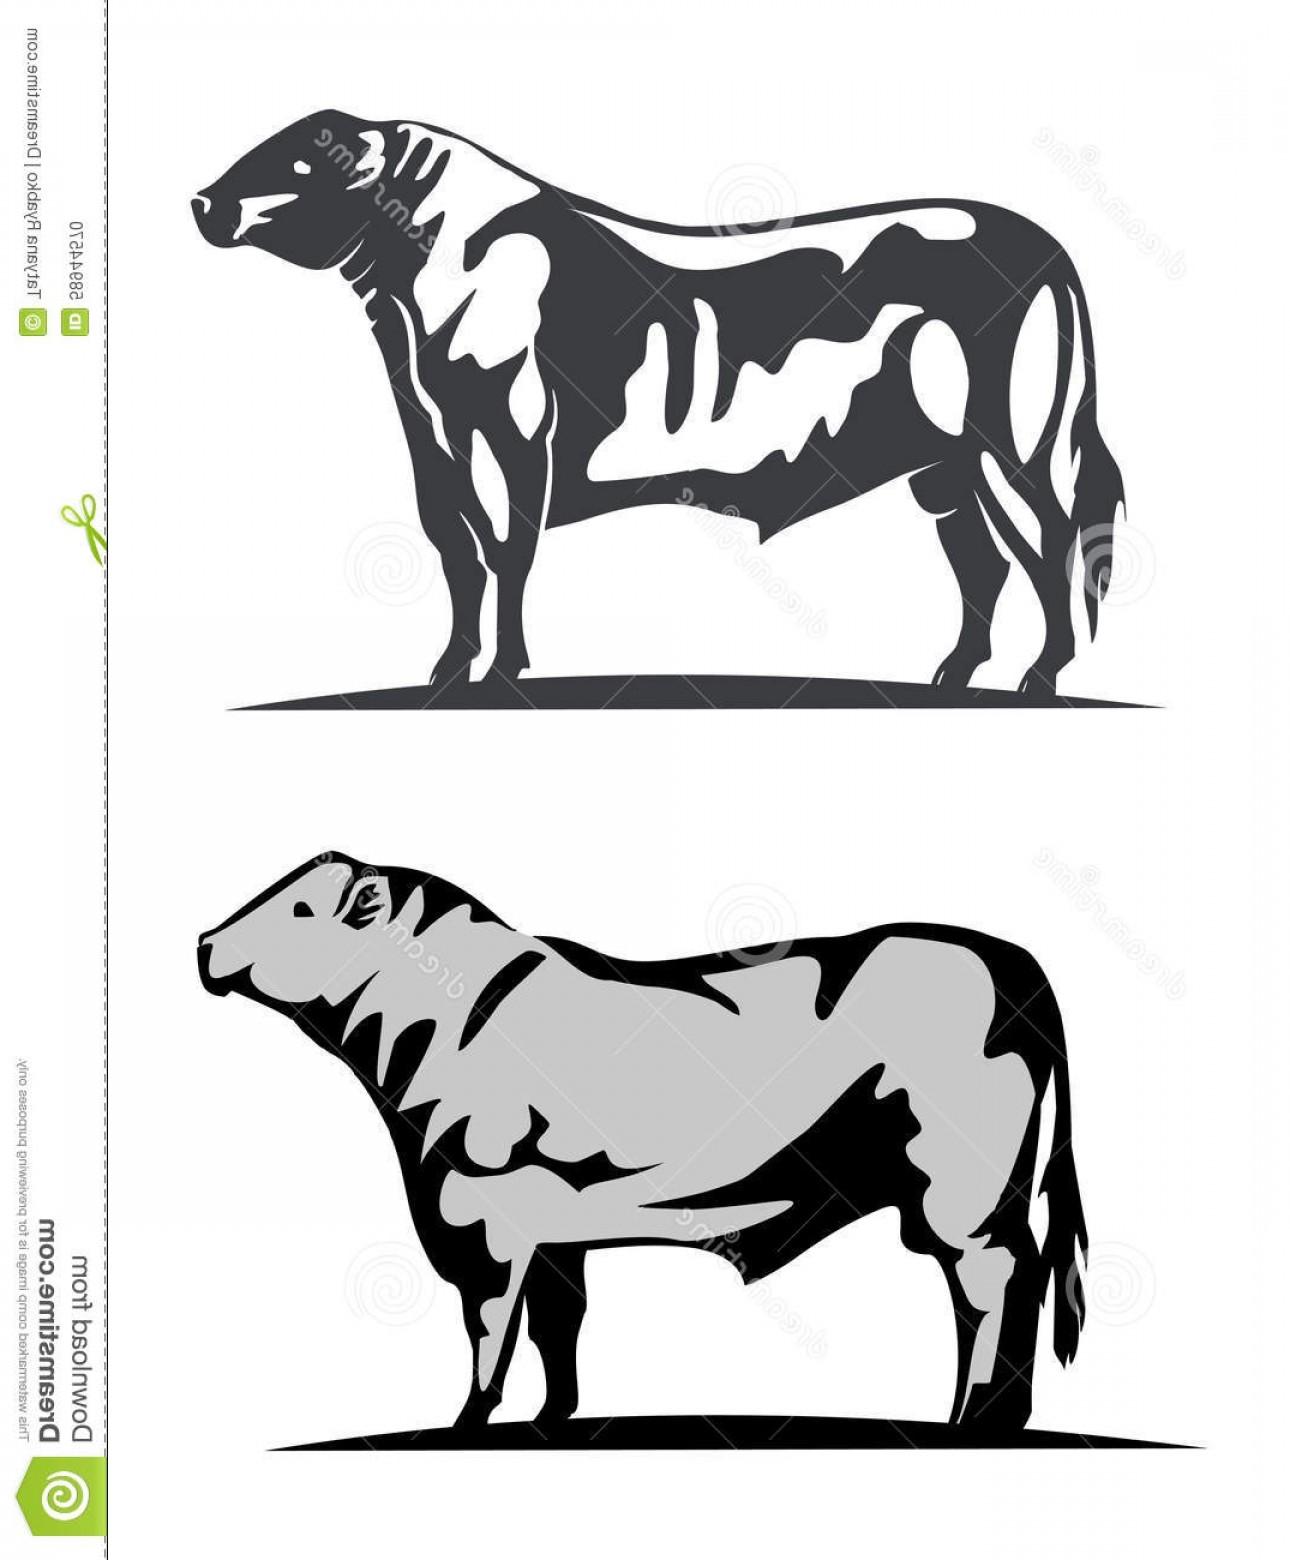 1290x1560 Angus Cow Vector Art Lazttweet